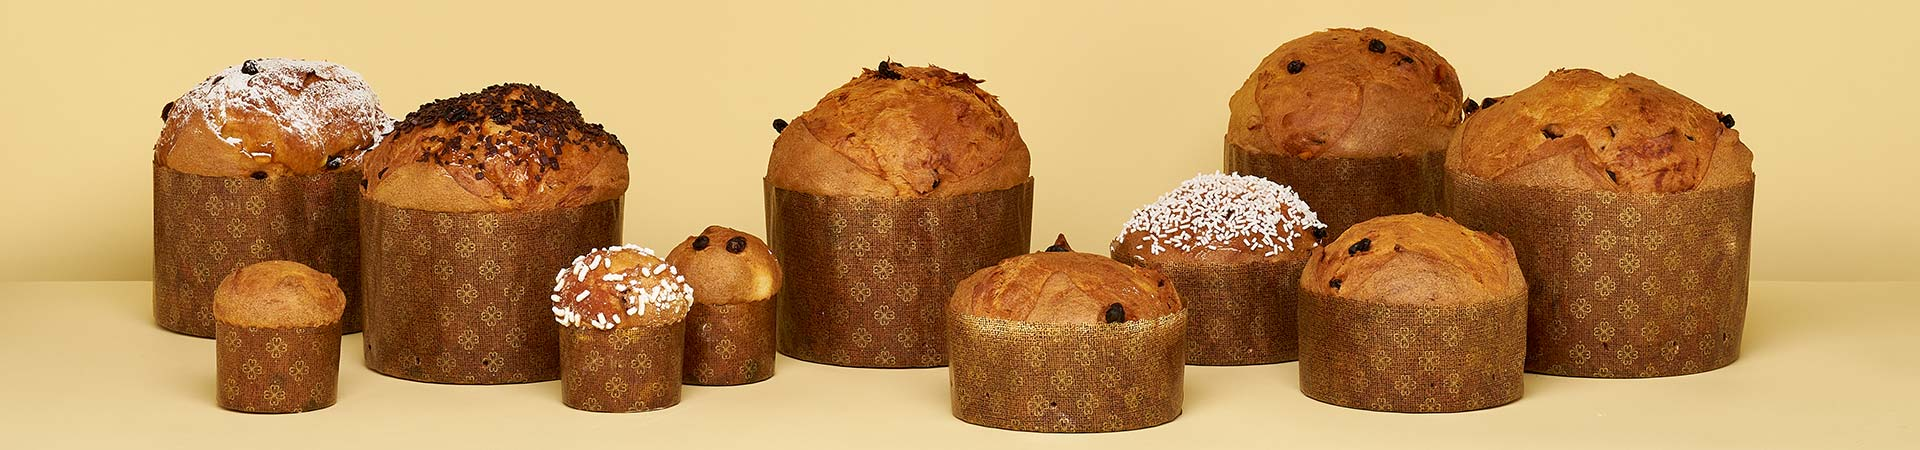 Novacart panettone paper baking molds